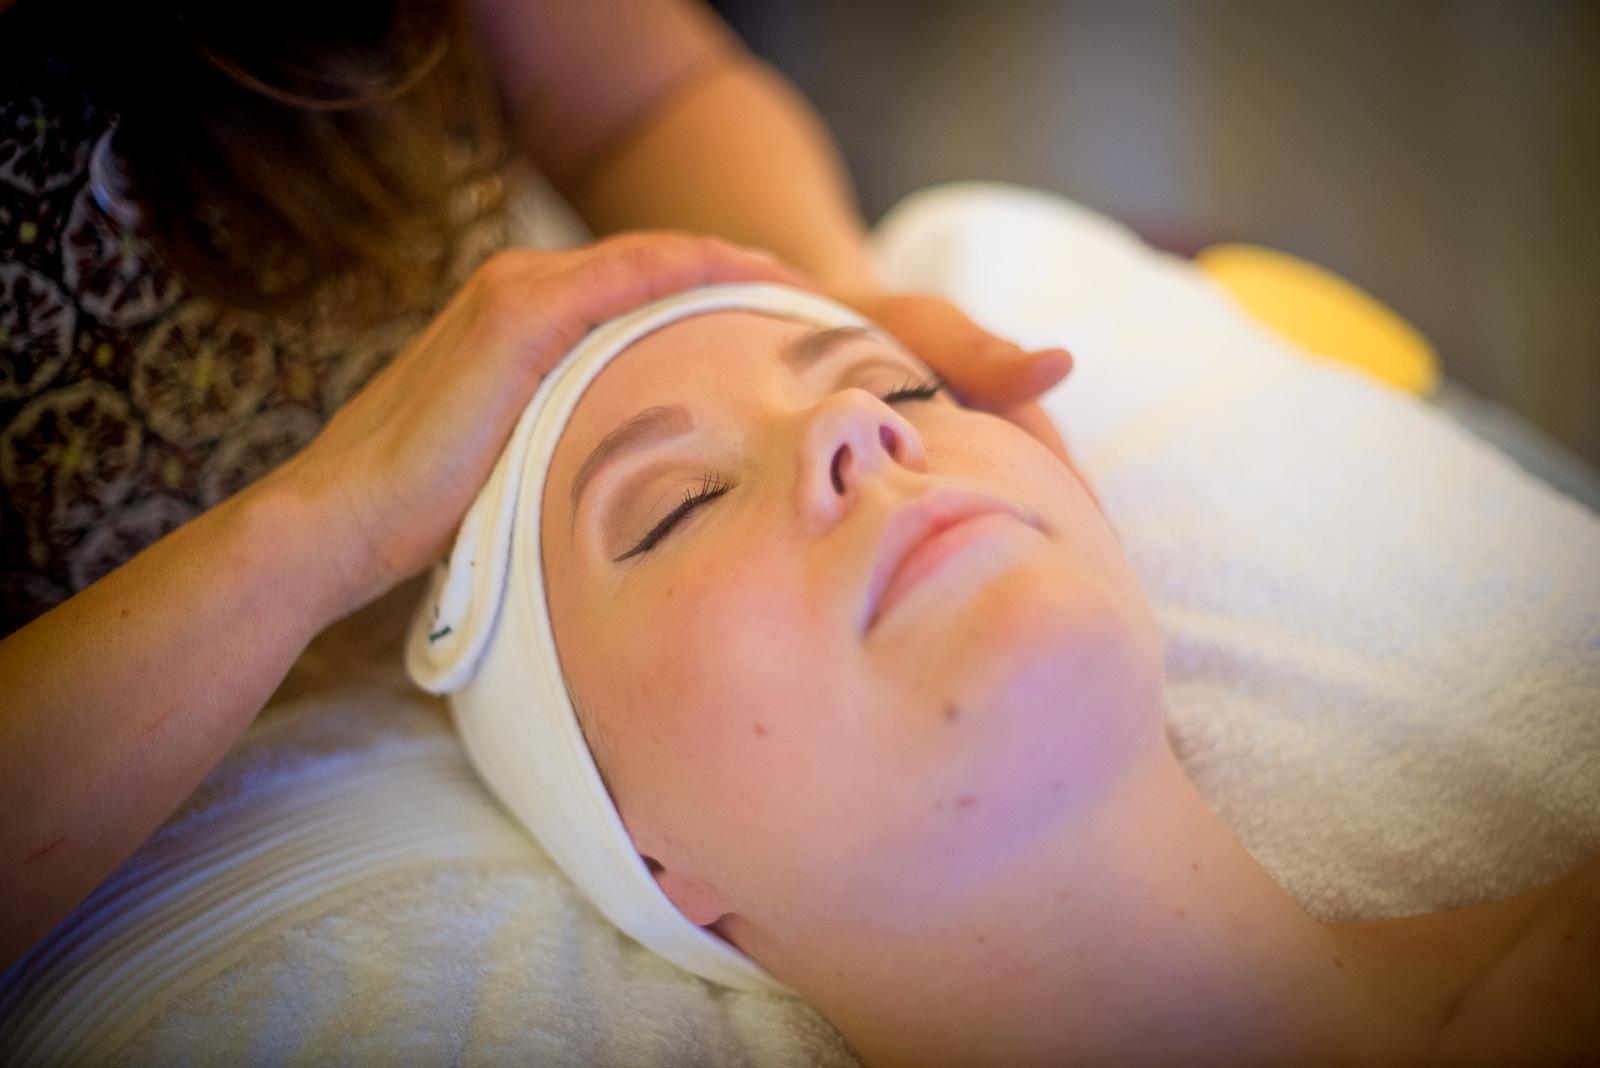 bäst massage djup hals